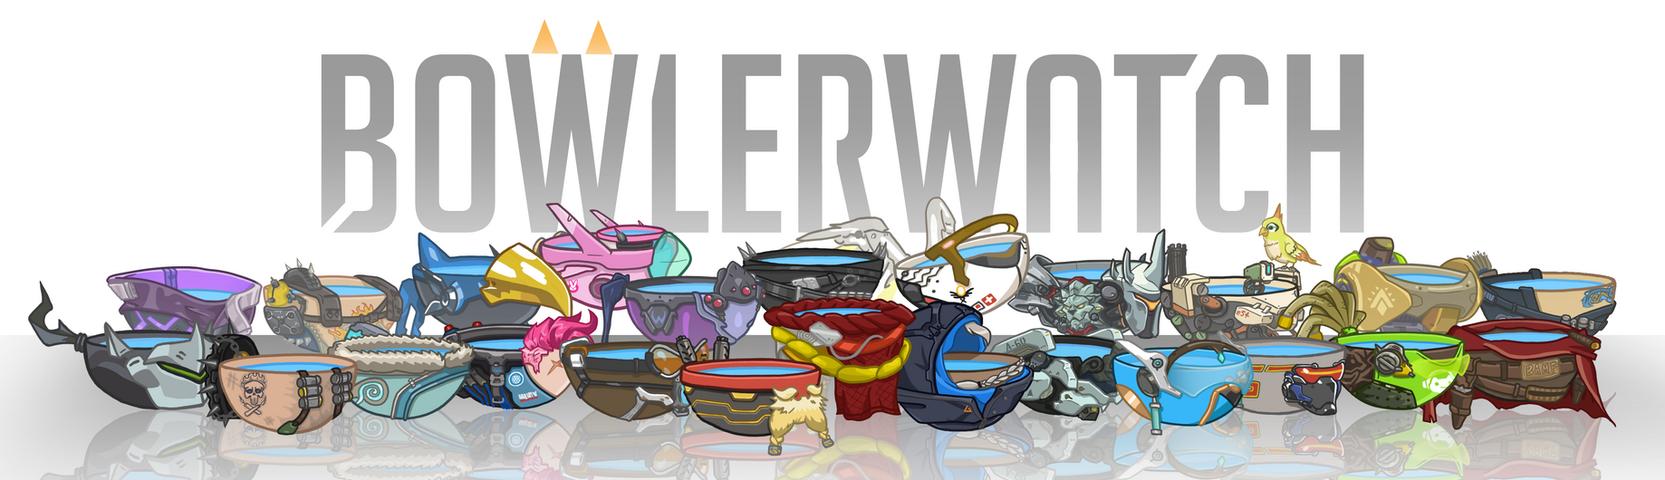 We are Bowlerwatch by Lukidjano